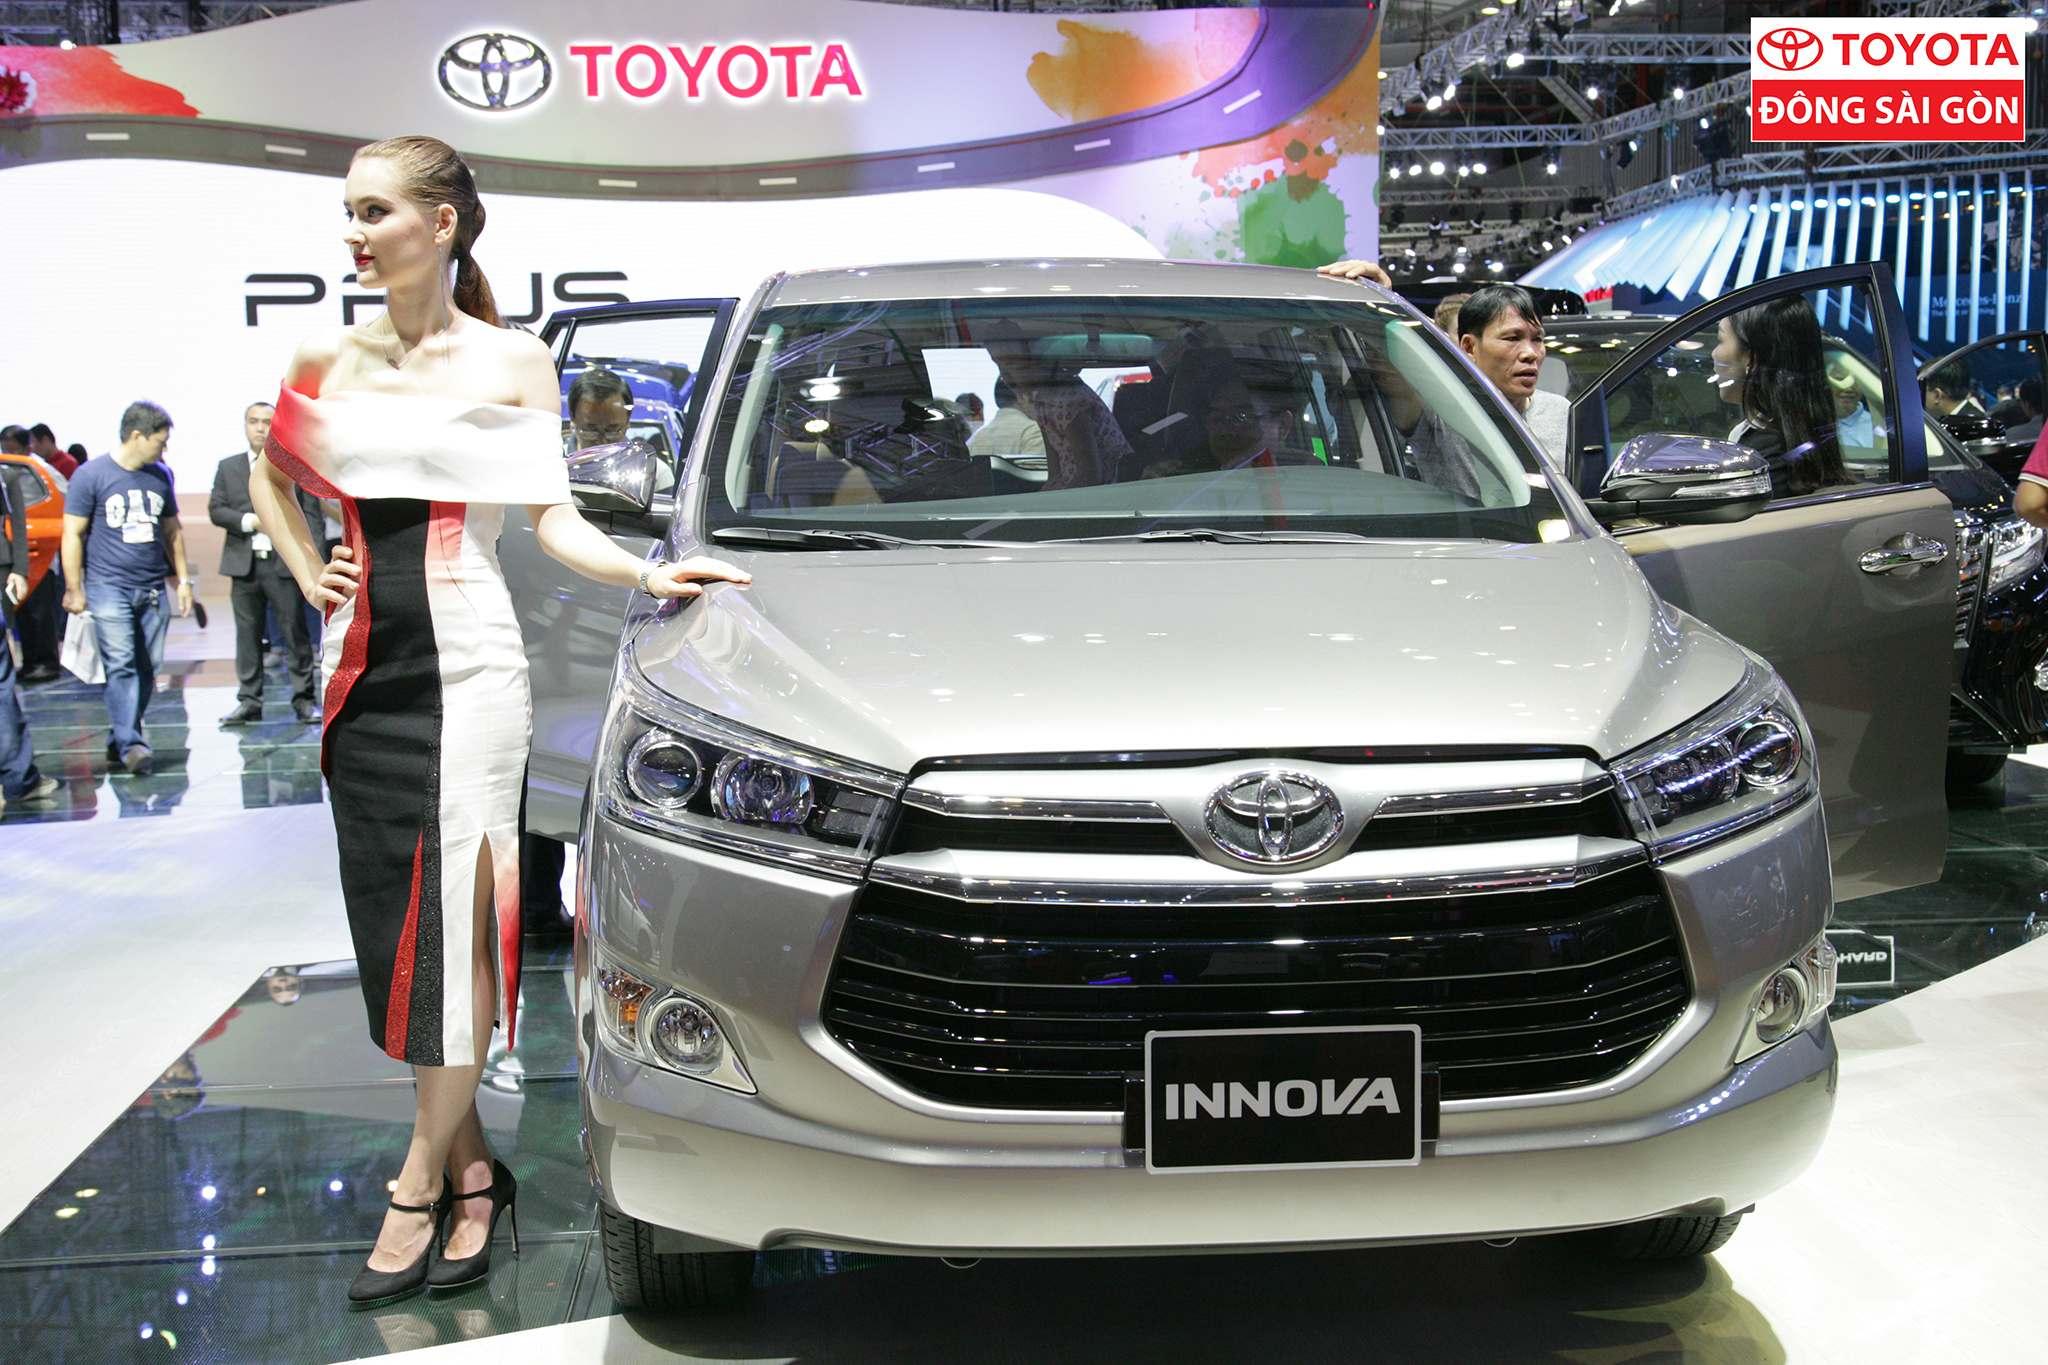 vietnam motor show 20178 Toyota at Vietnam Motor Show 2017